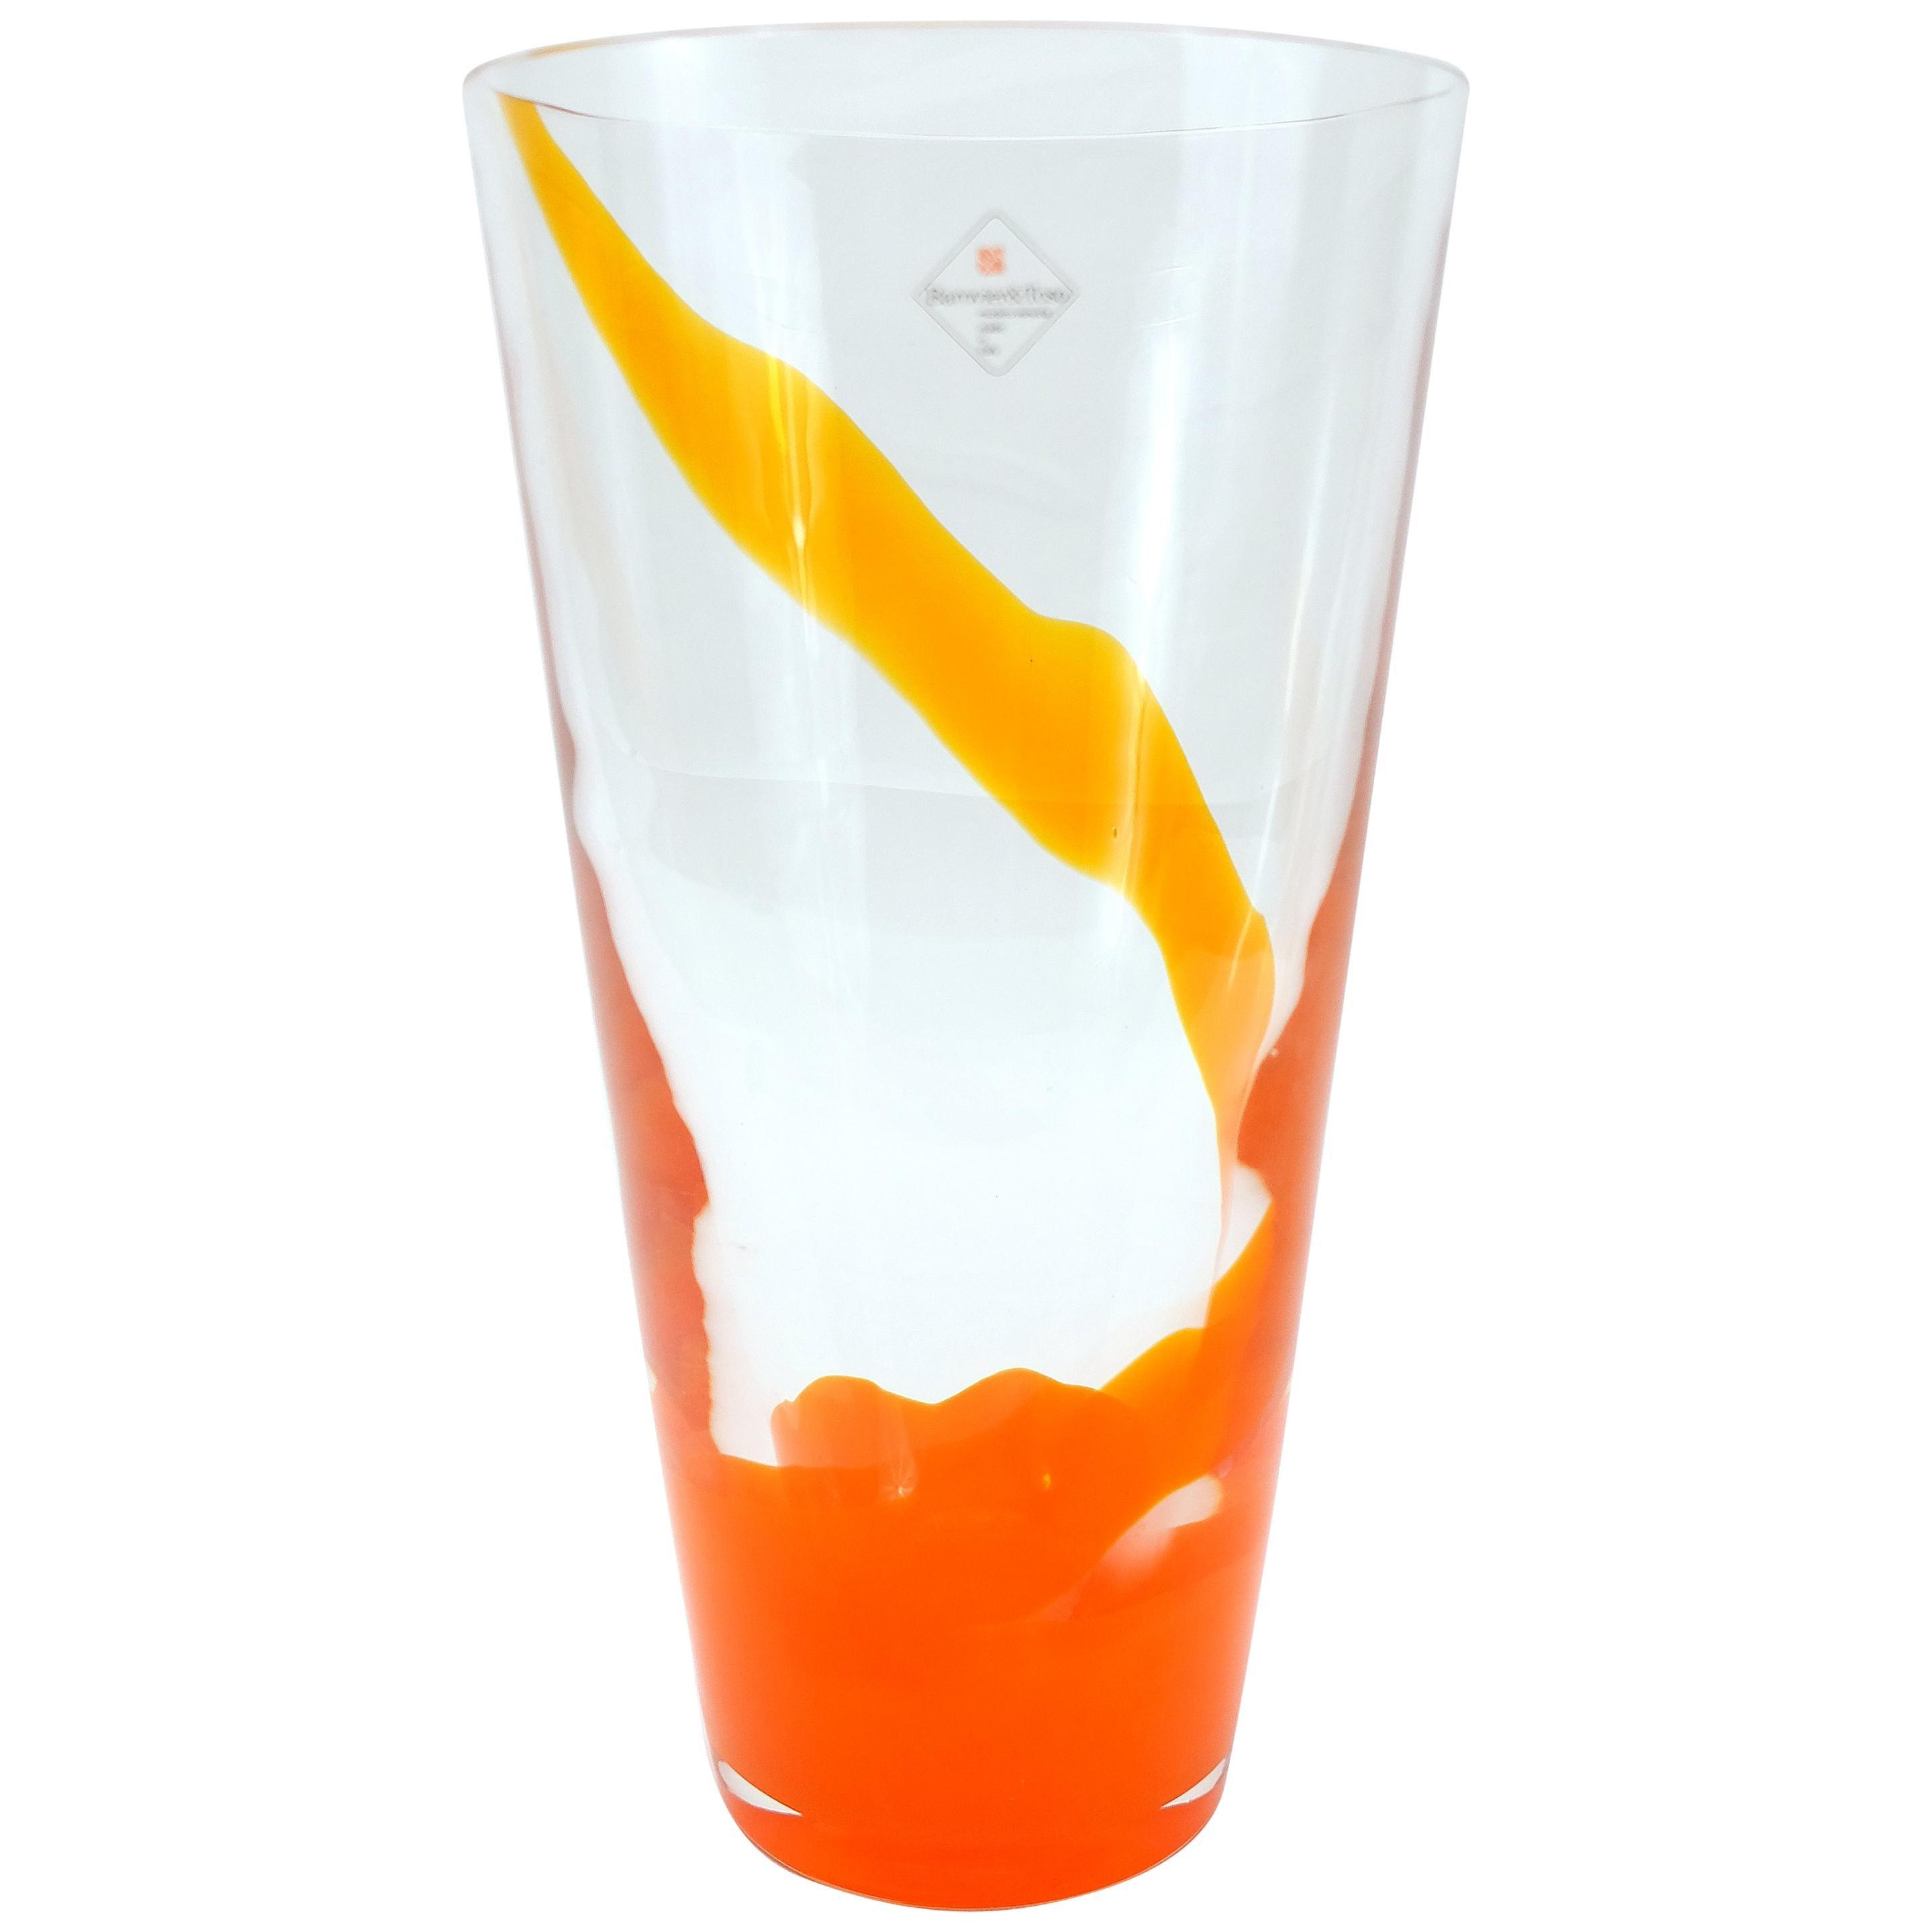 Barovier & Toso Orange Murano Glass Vase